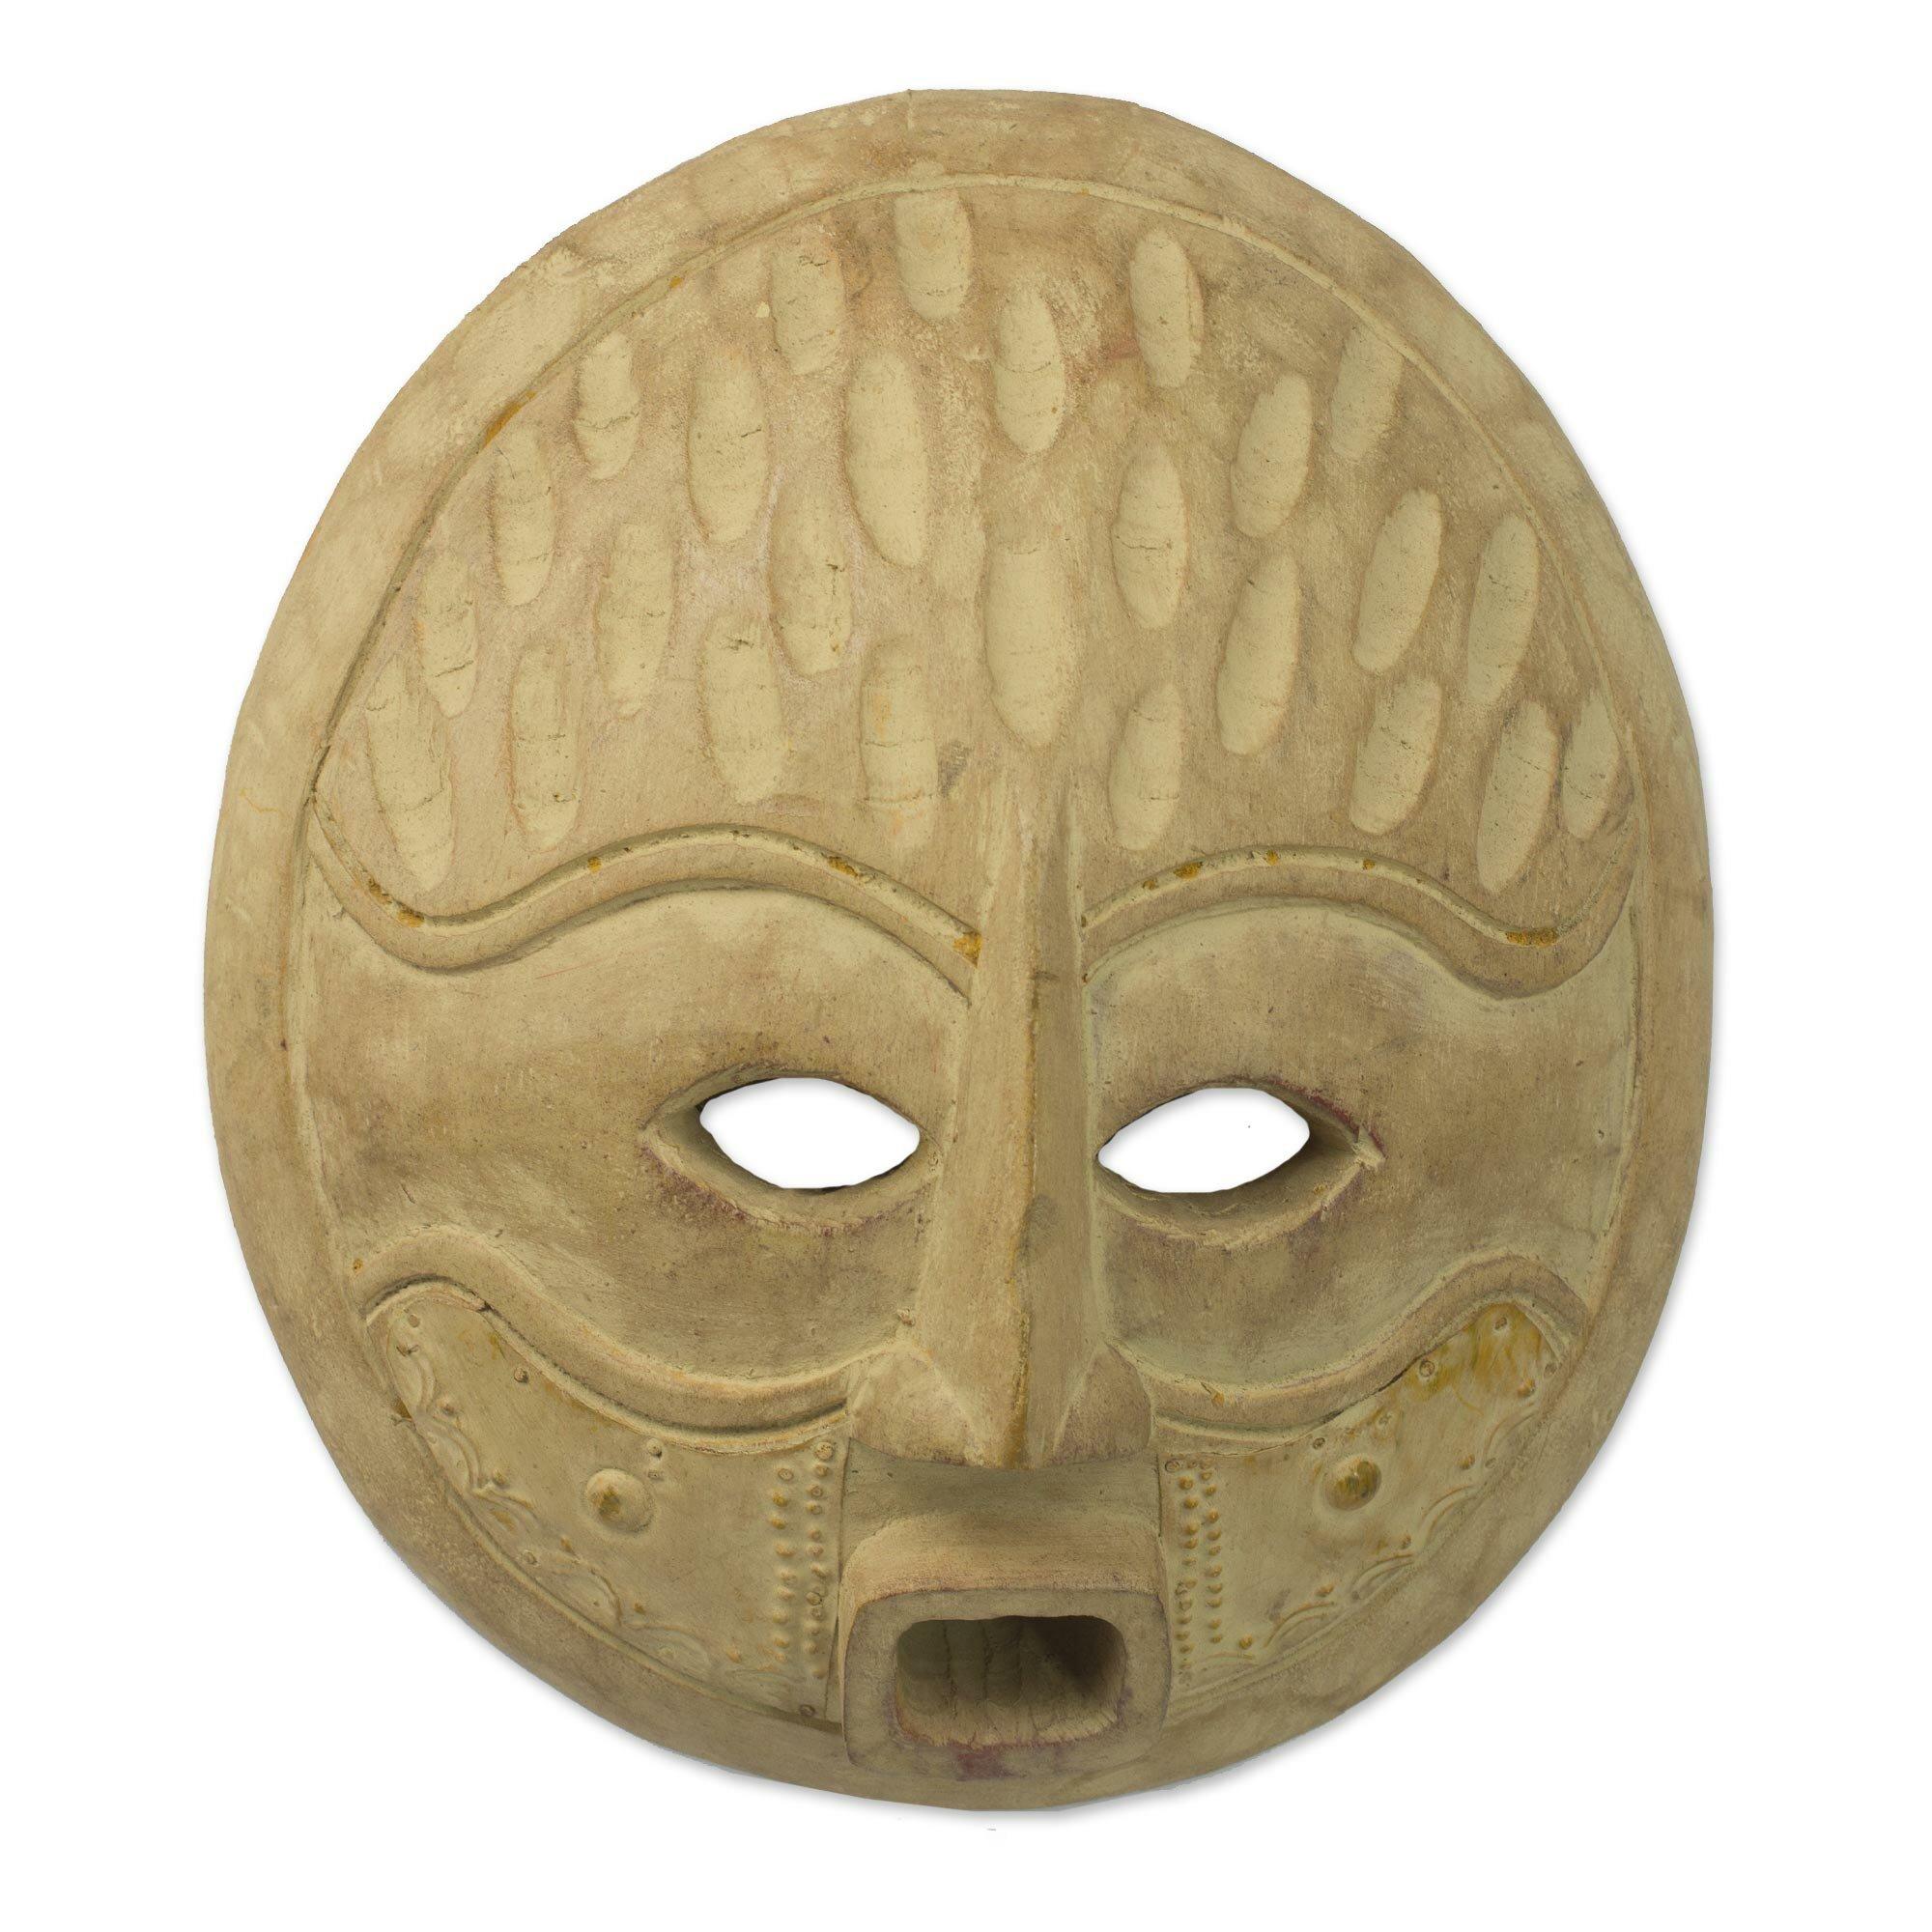 Novica Artisan Crafted Wood Mask Wall Décor | Wayfair